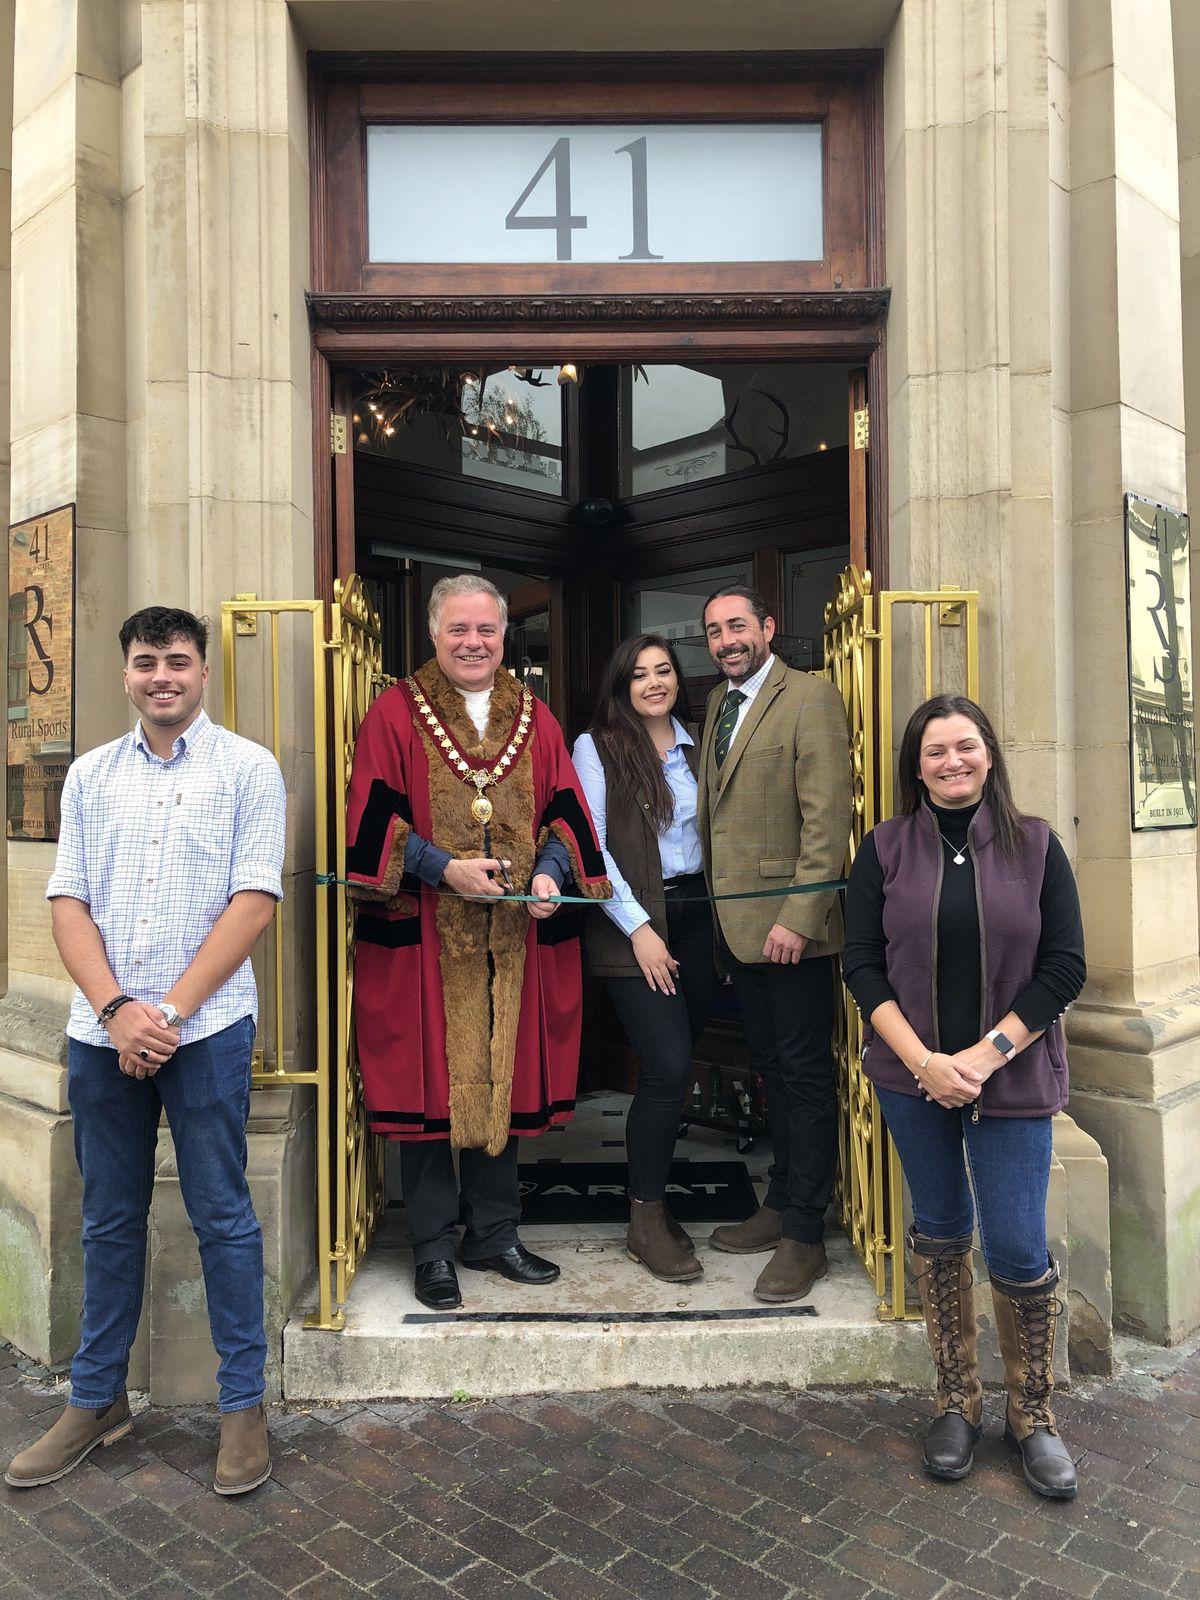 From left, Ritchie Smith, Mayor of Llanfyllin, Demi Smith, Richard Smith, and Liza Jane Smith.